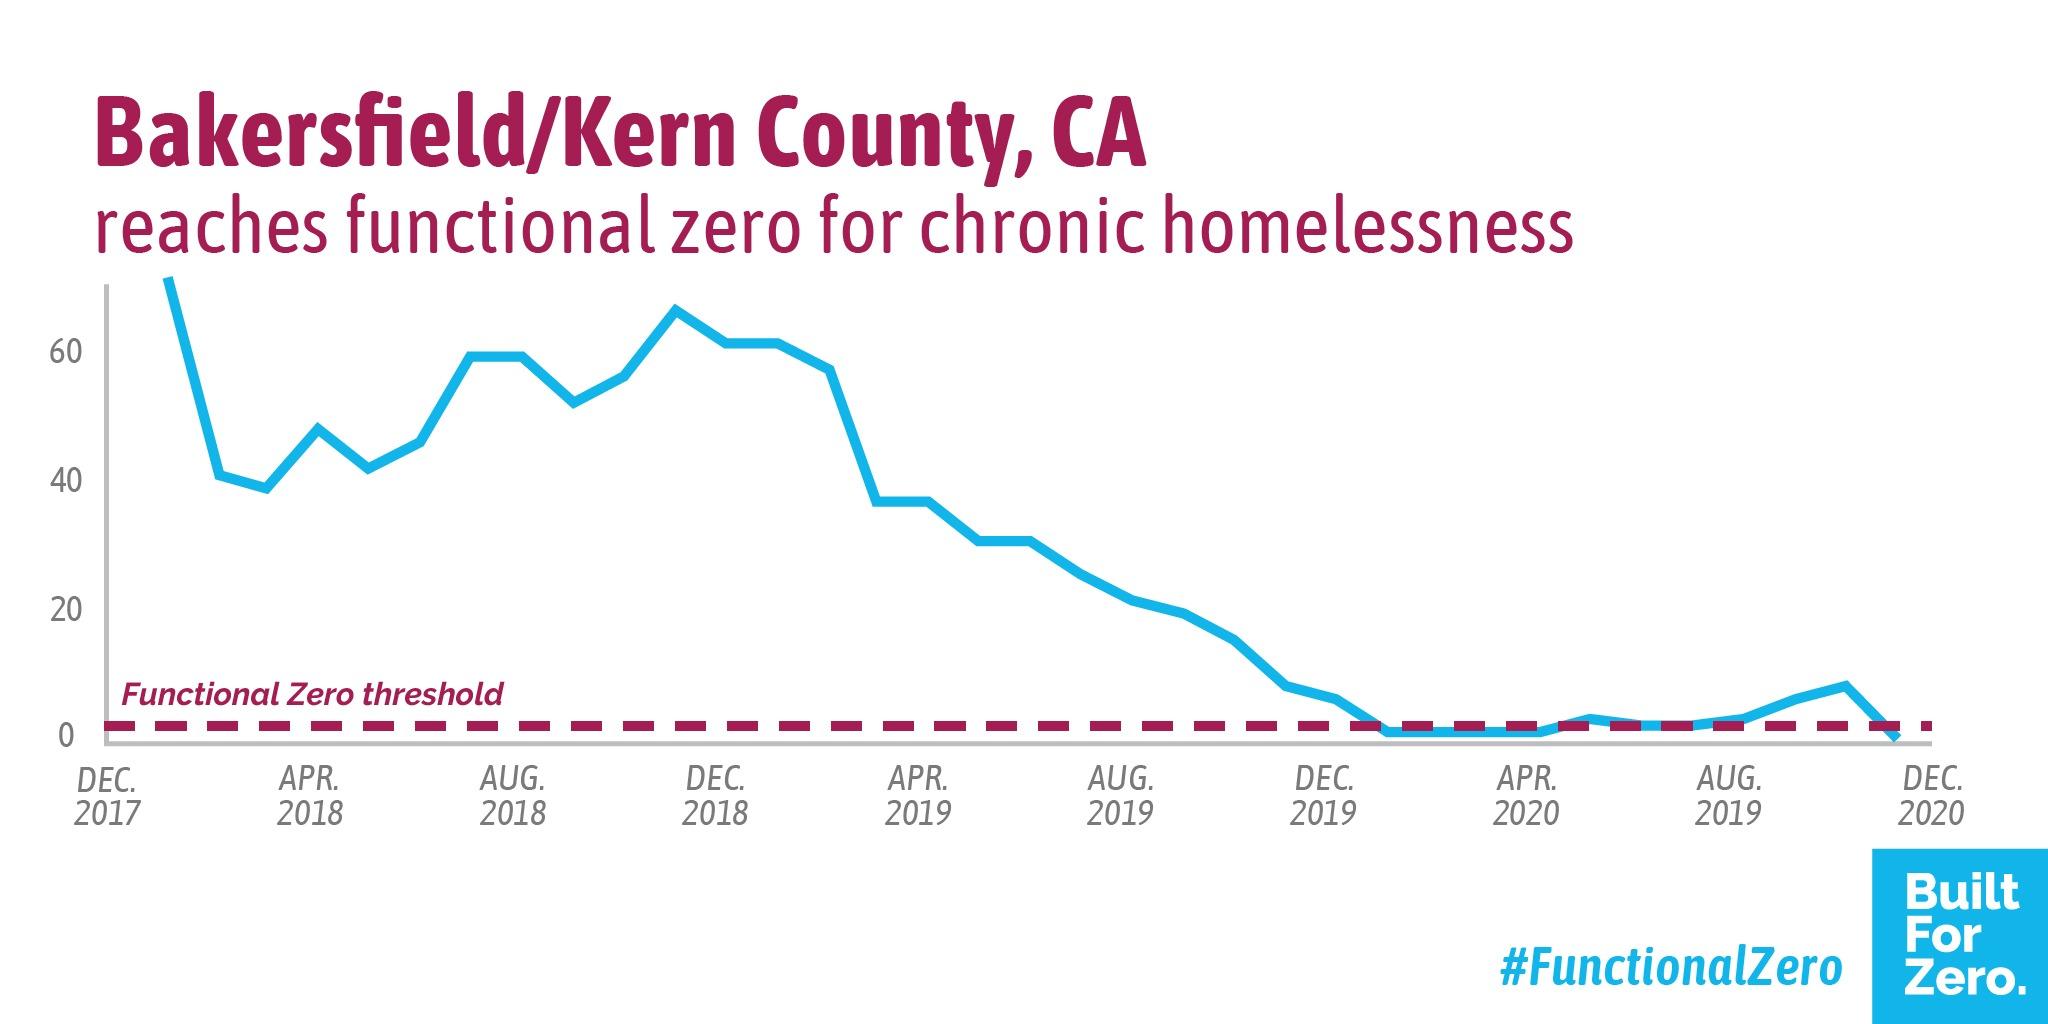 Bakersfield, California, has achieved functional zero for chronic homelessness